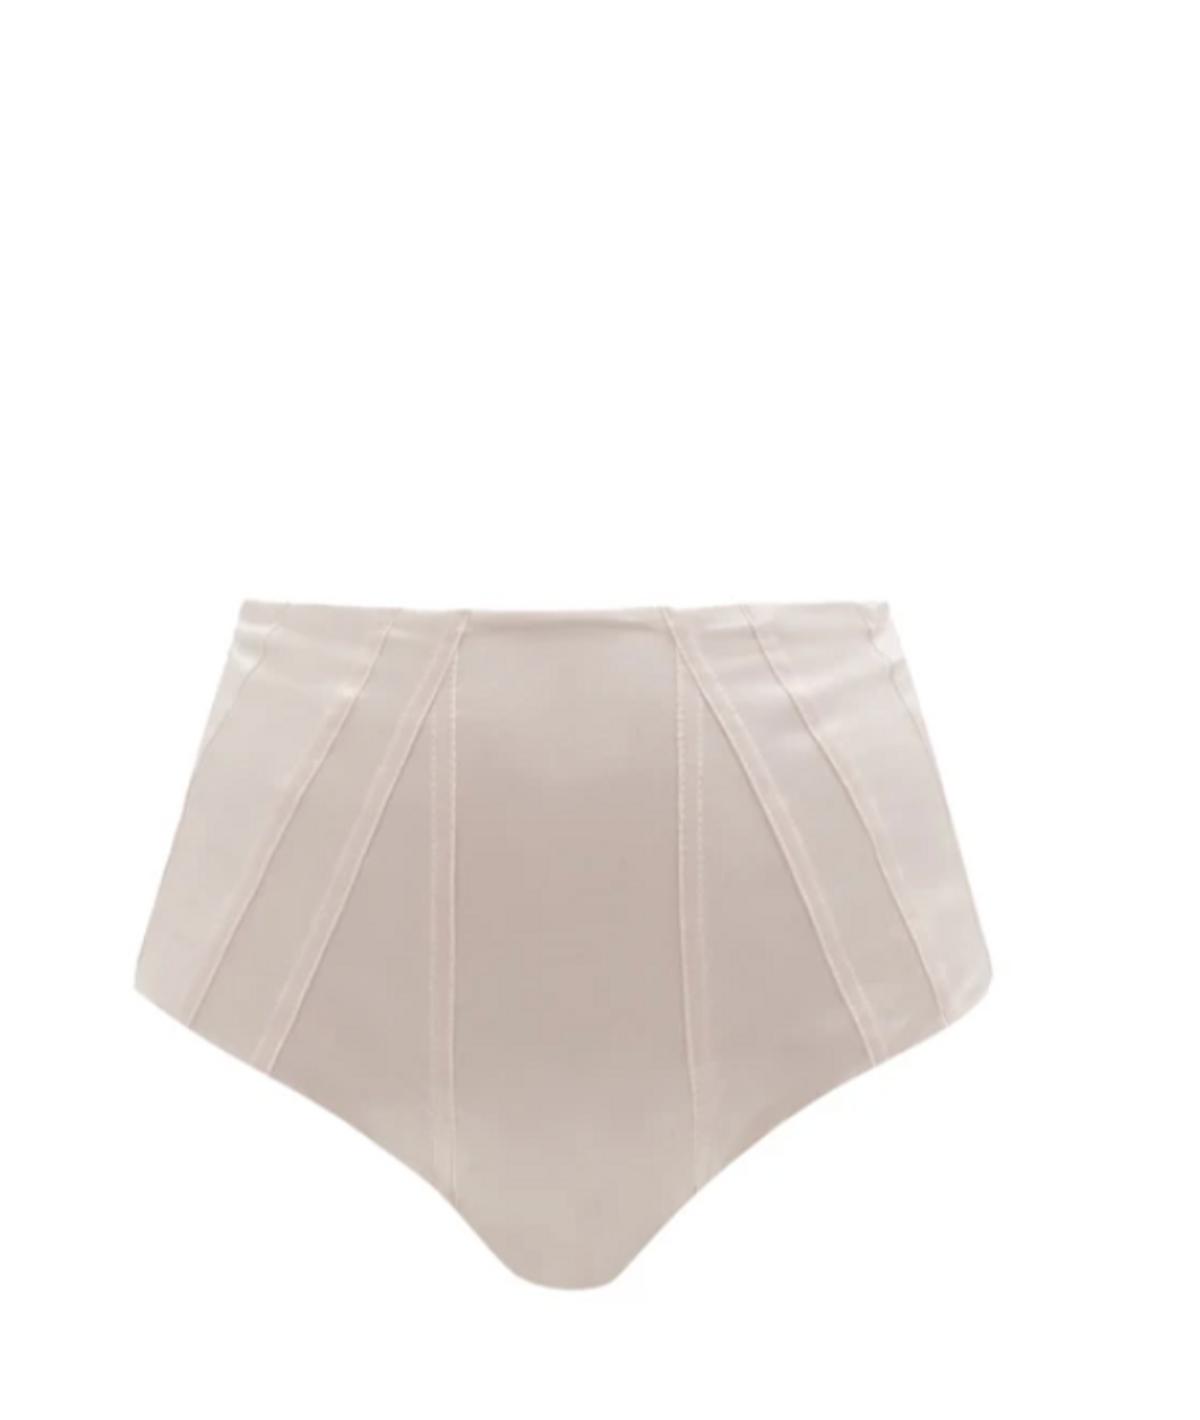 Course High-Rise Panelled Metallic Bikini Briefs